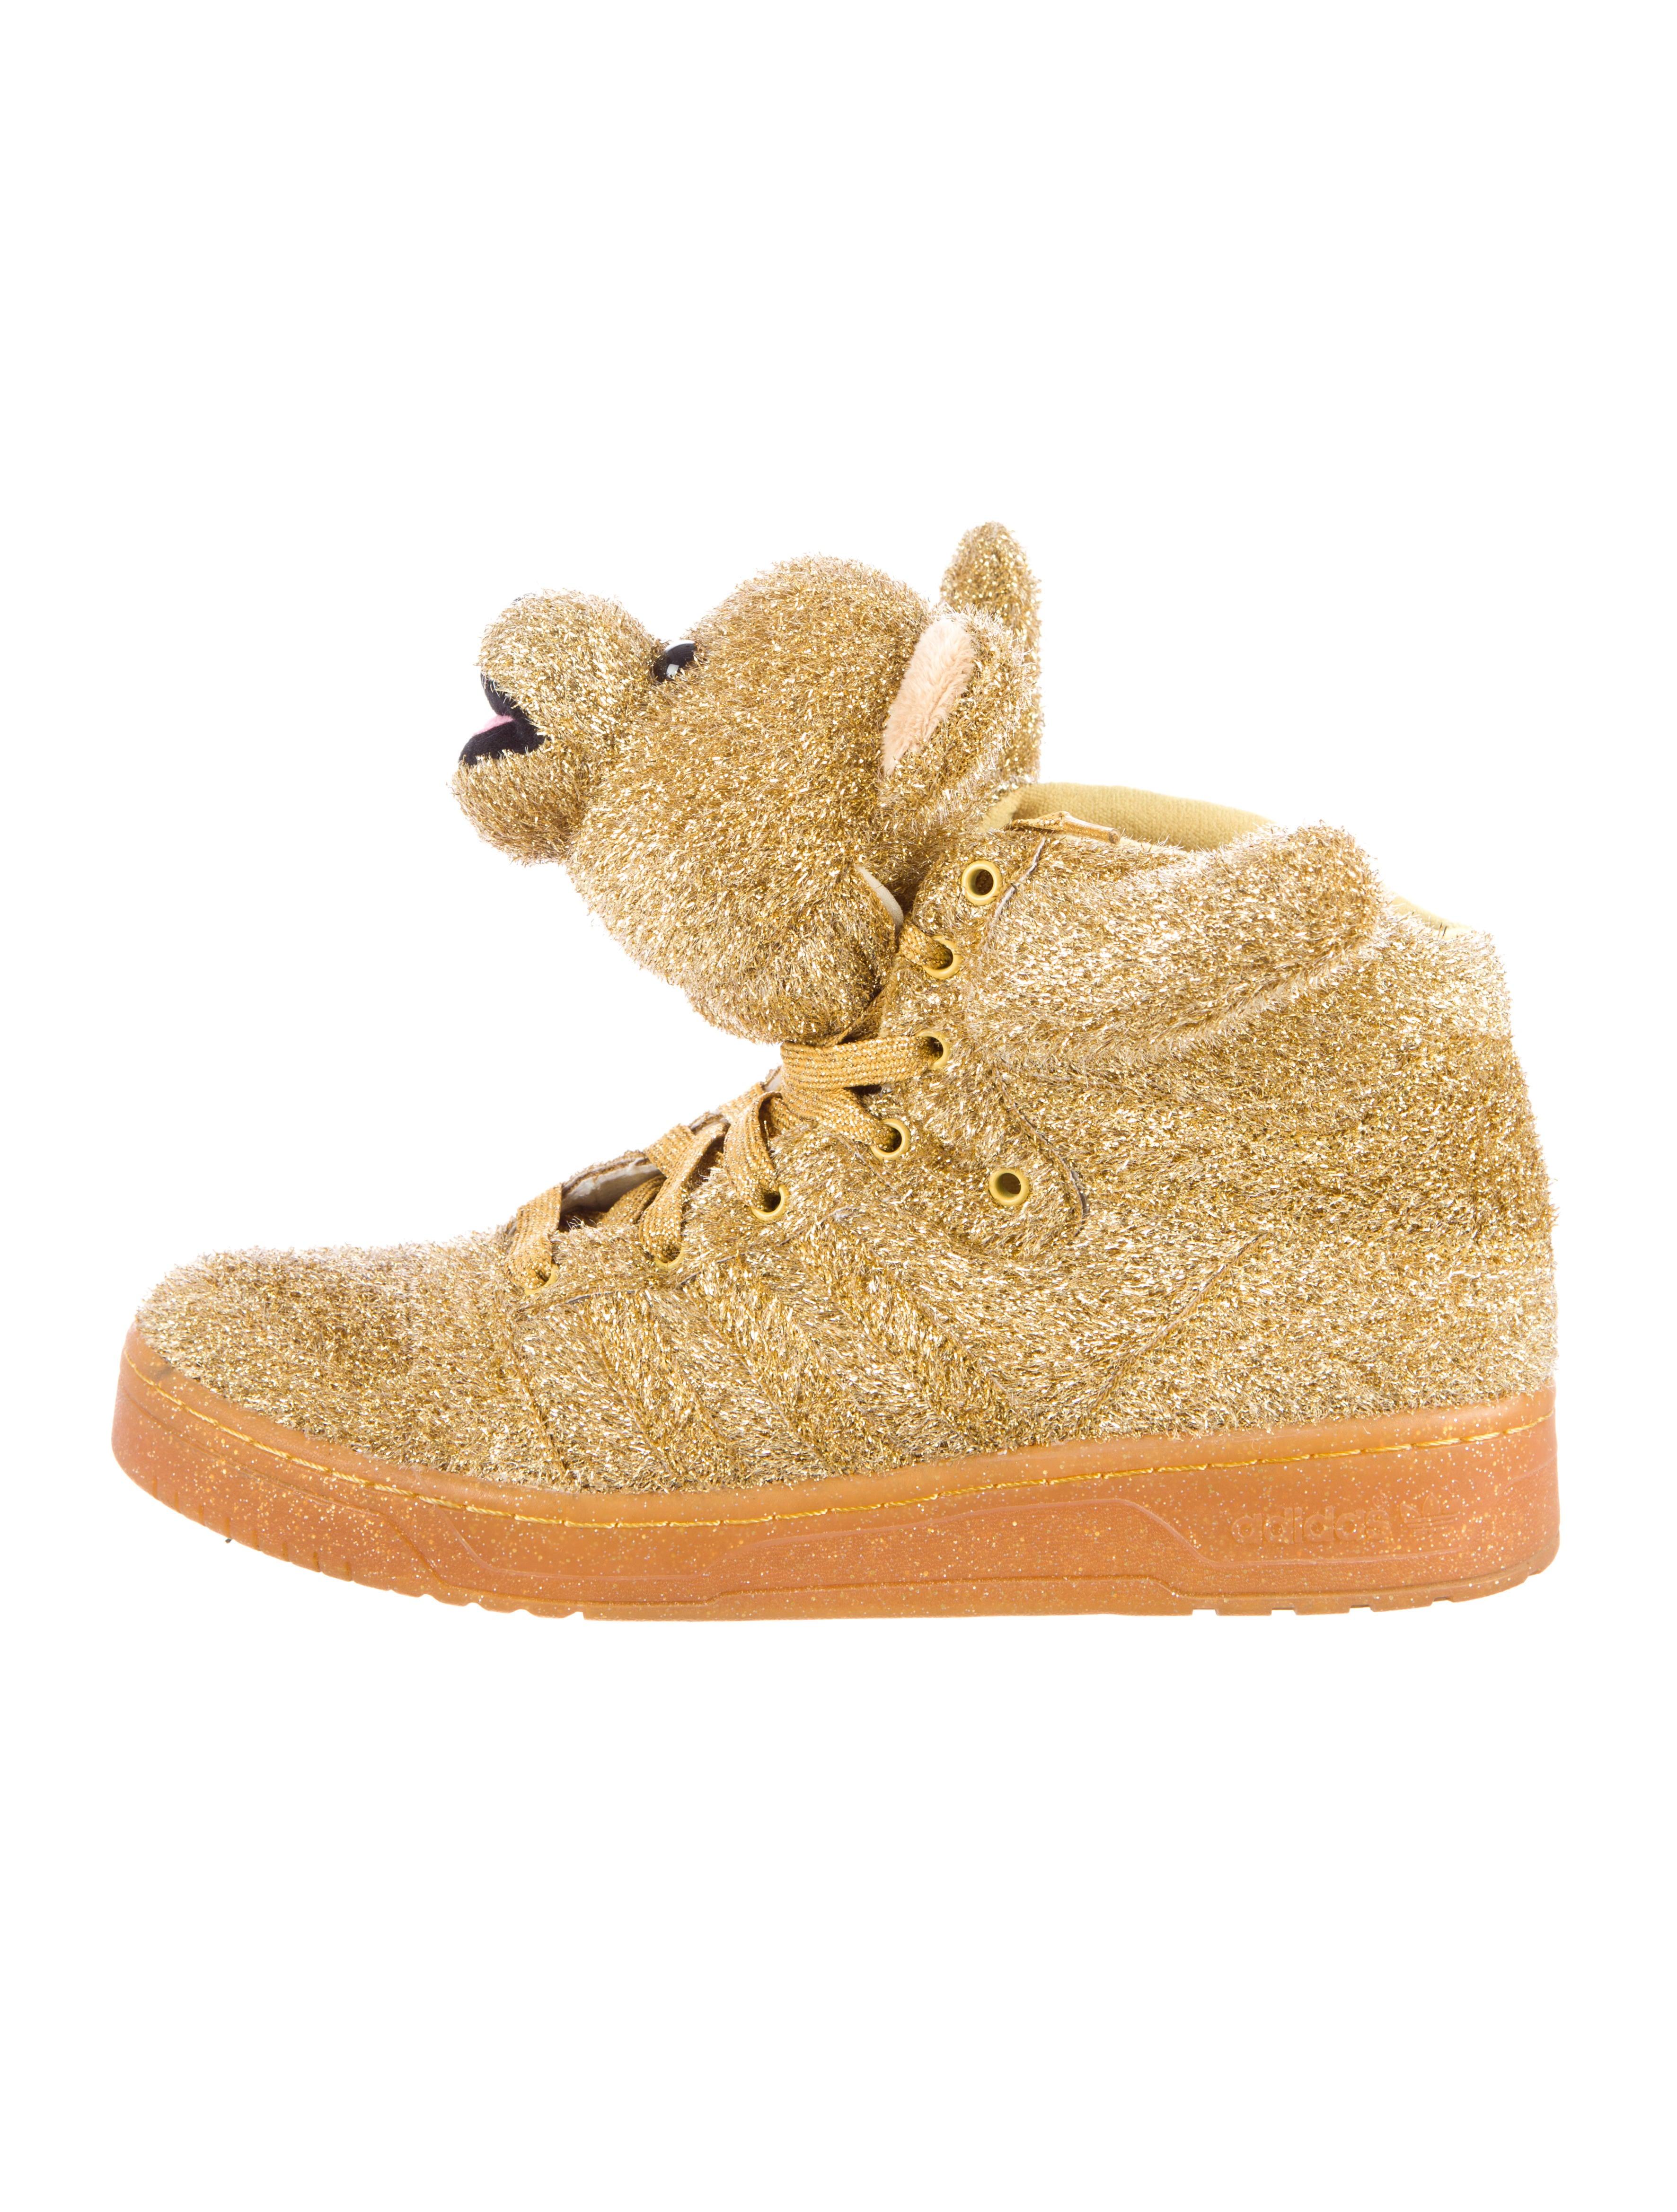 jeremy scott x adidas tinsel orso scarpe wja20062 le scarpe